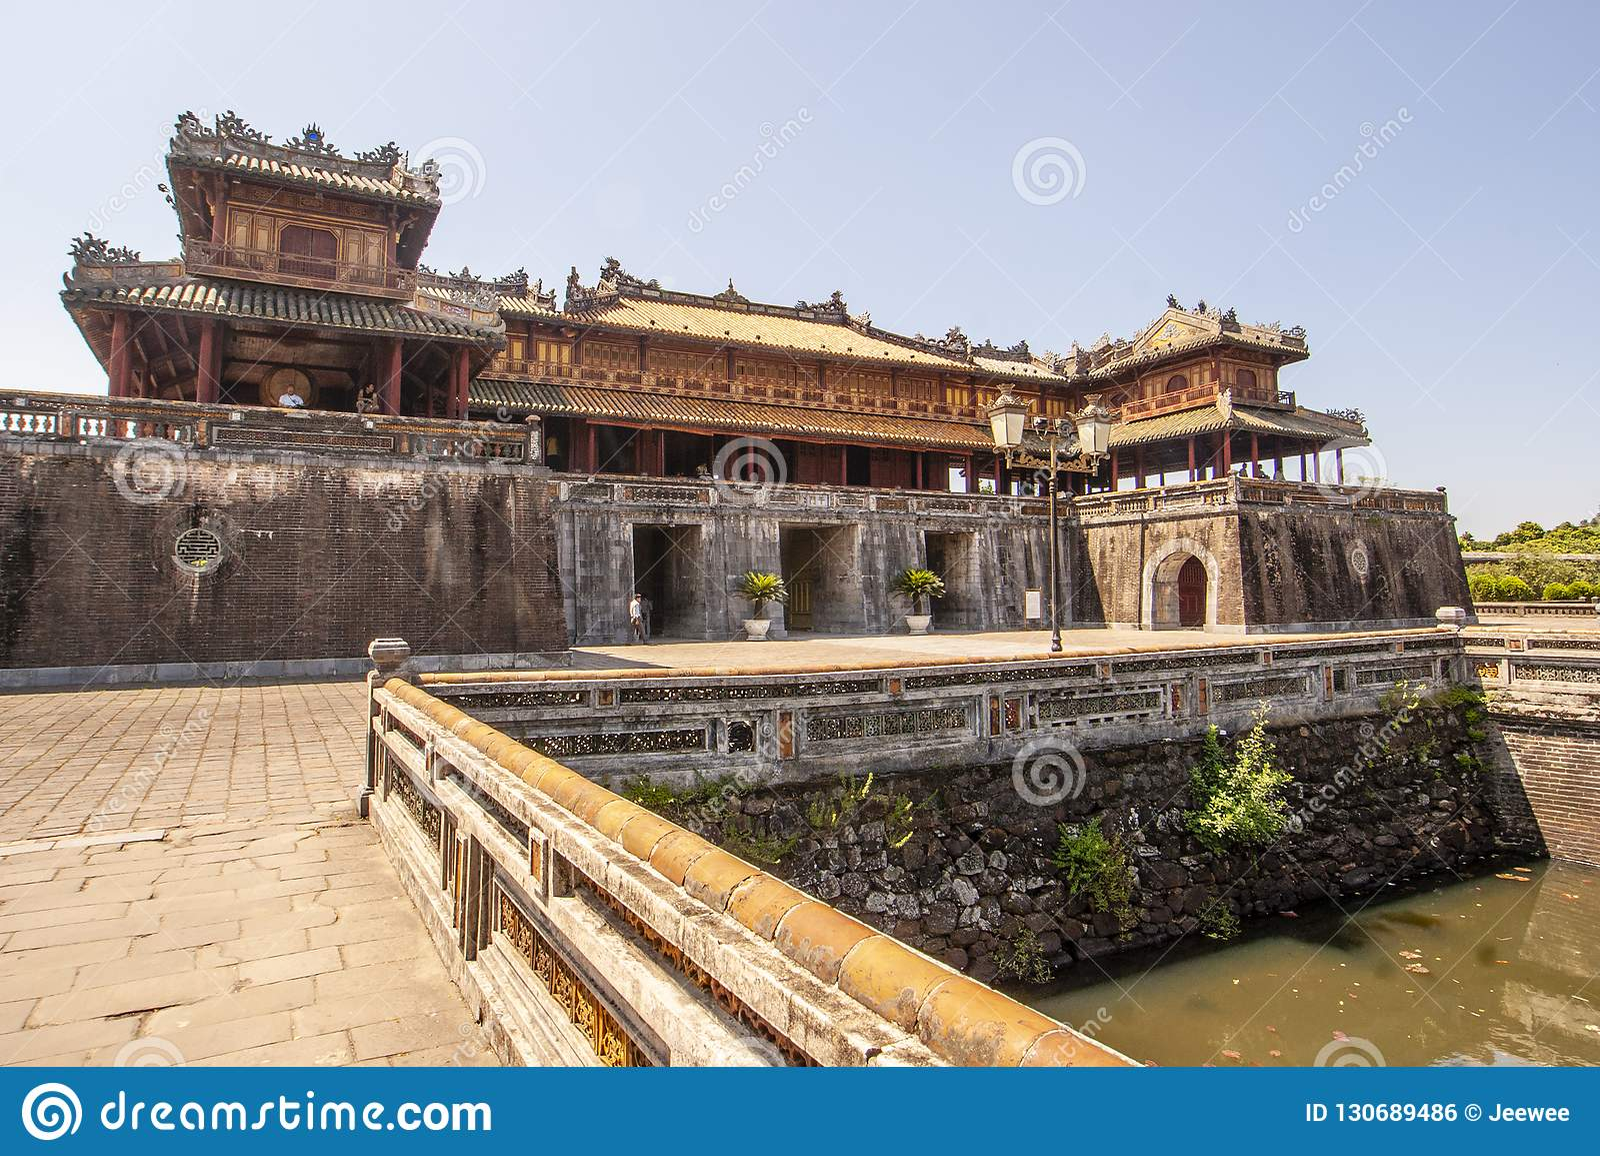 Exterior of the Ngo Mon Gate, part of the Citadel in former Vietnamese capital Hué, Central Vietnam, Vietnam